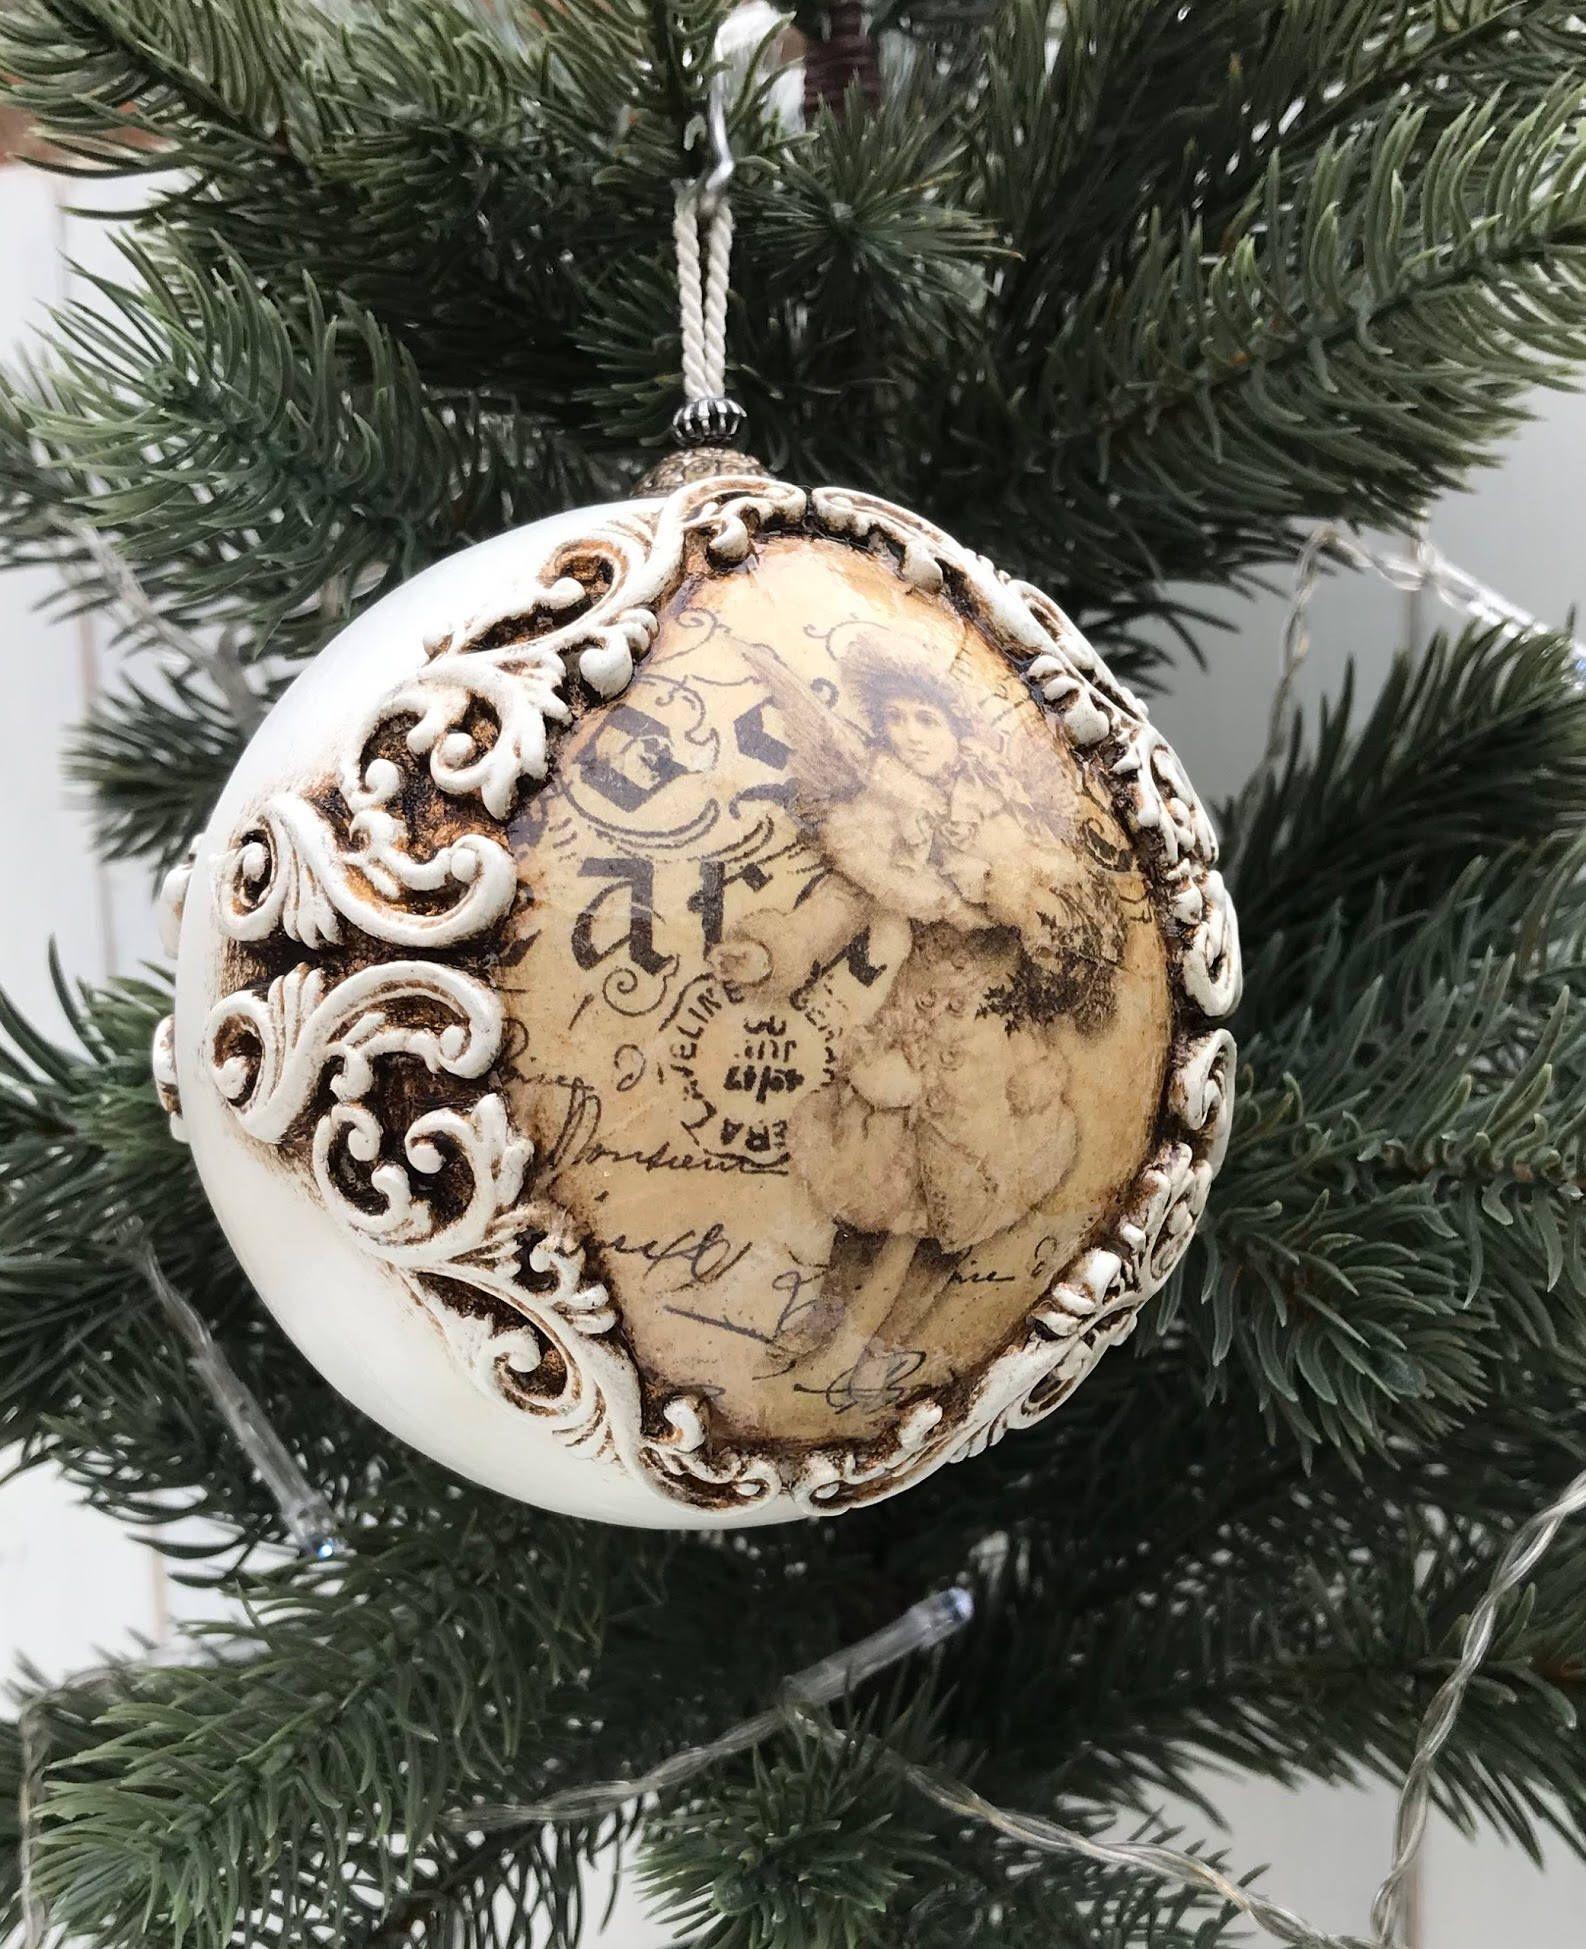 Vintage Shabby Chic Christmas Ornament Decoration Bauble By Littlethingsofjo On E Christmas Ornaments Shabby Chic Christmas Ornaments Chic Christmas Decor